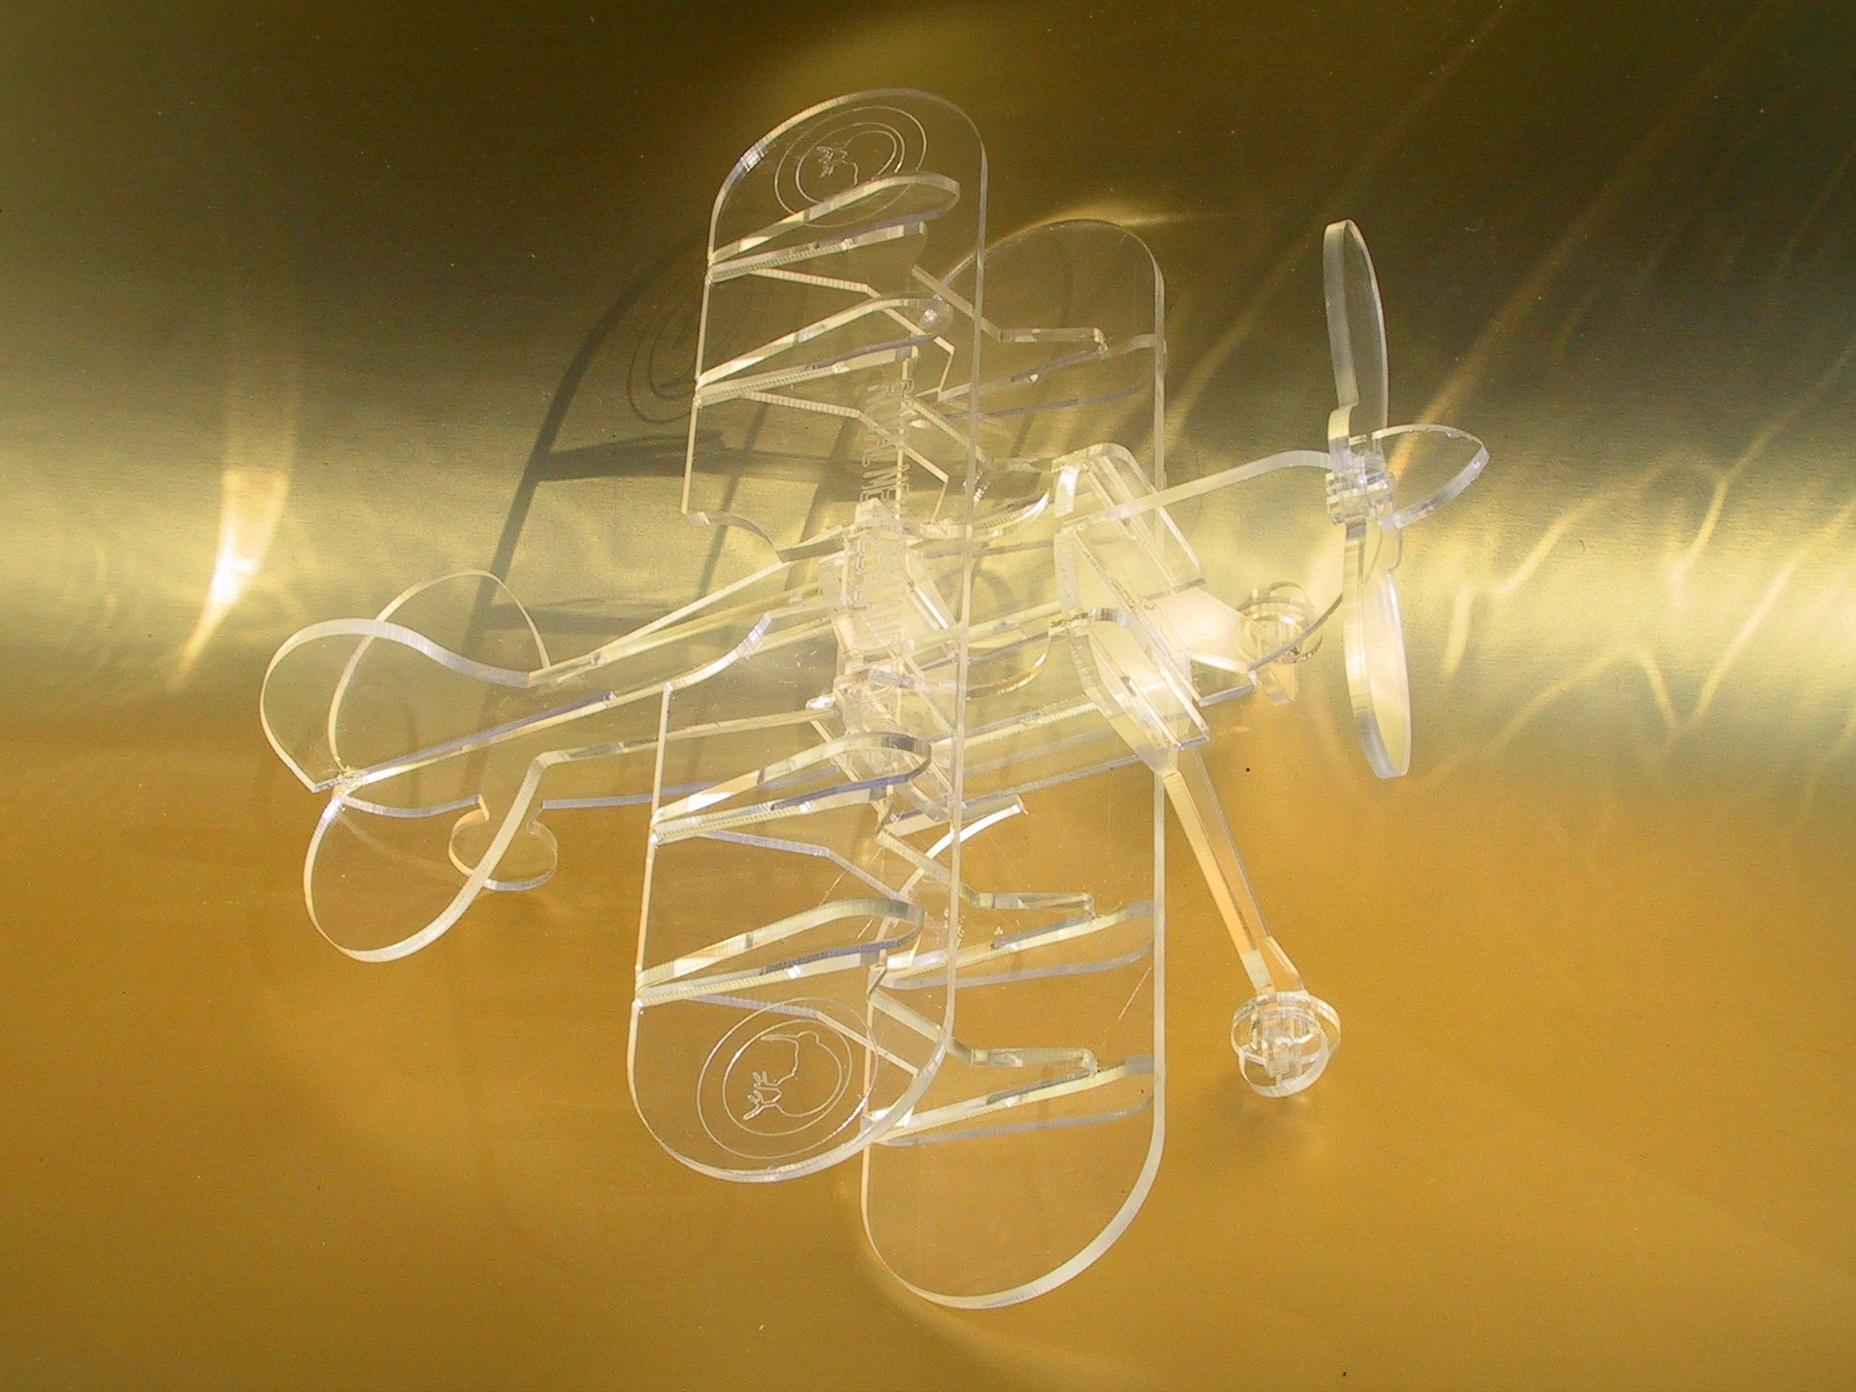 Biplane Laser Cut Free Vector